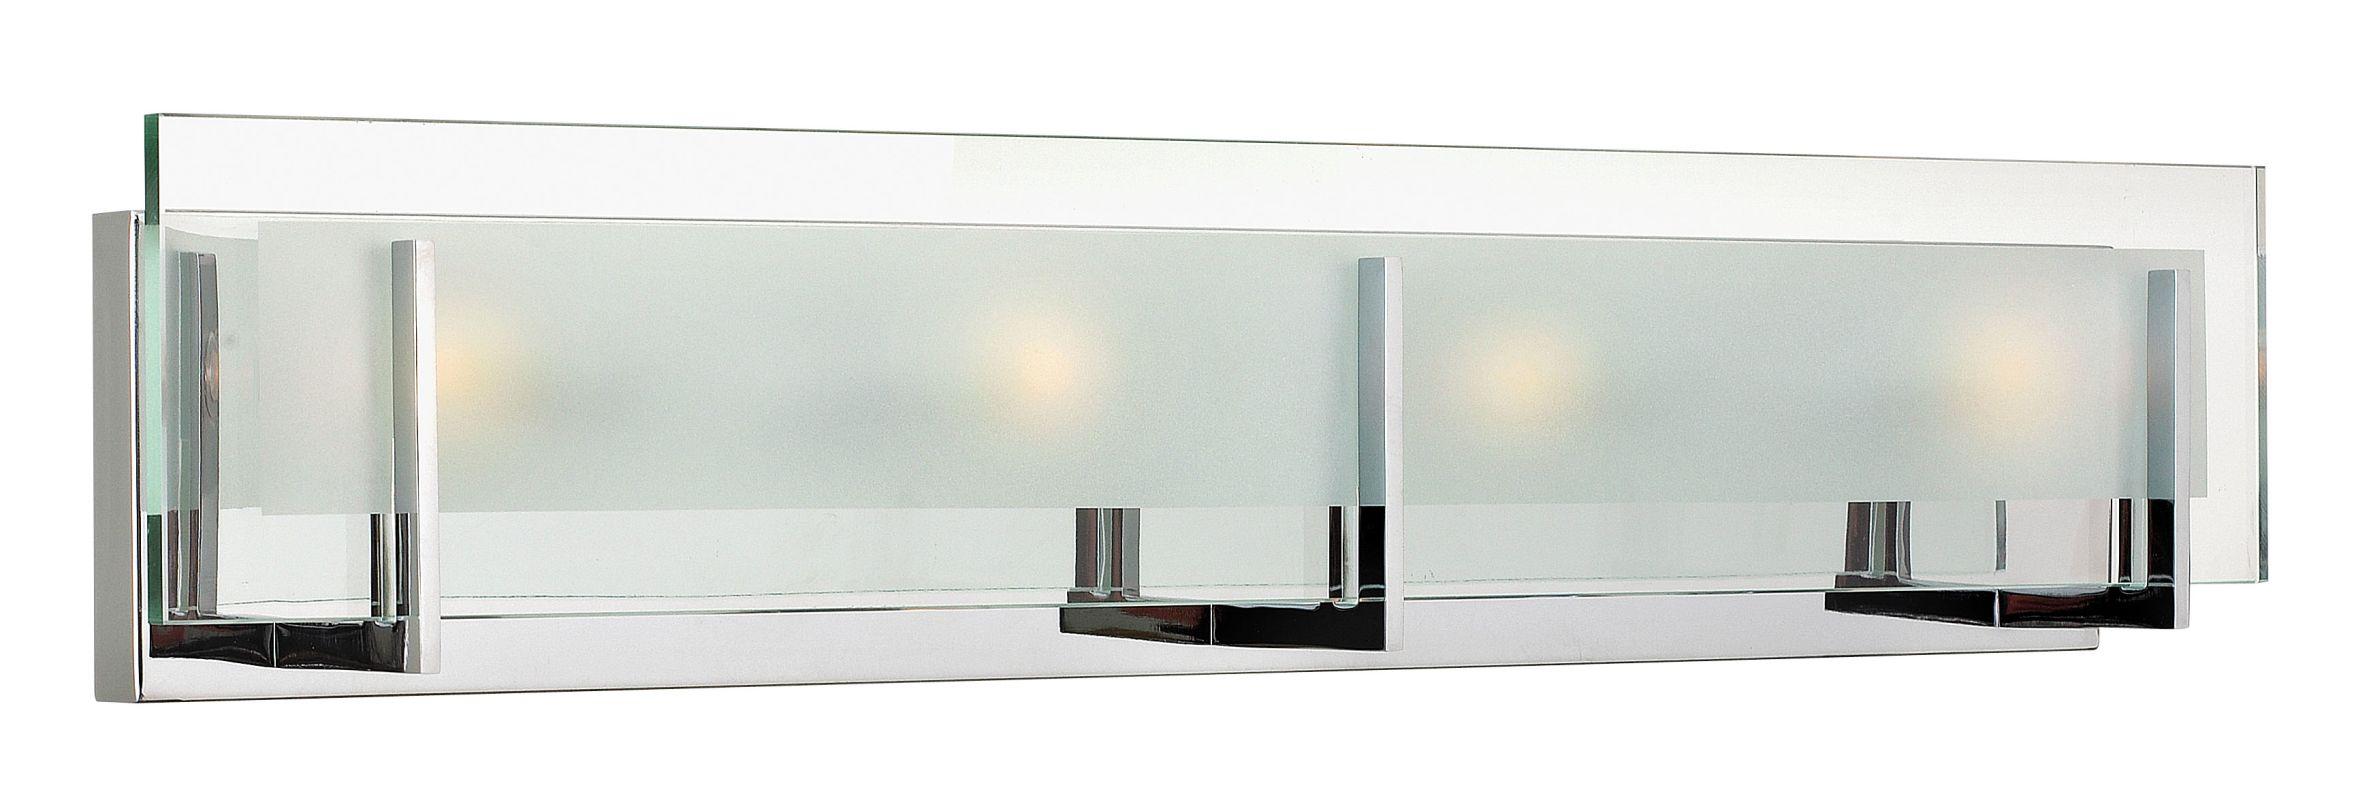 Hinkley Lighting 5654 4 Light ADA Compliant Bath Bar from the Latitude Sale $229.00 ITEM#: 2234001 MODEL# :5654CM UPC#: 640665565430 :